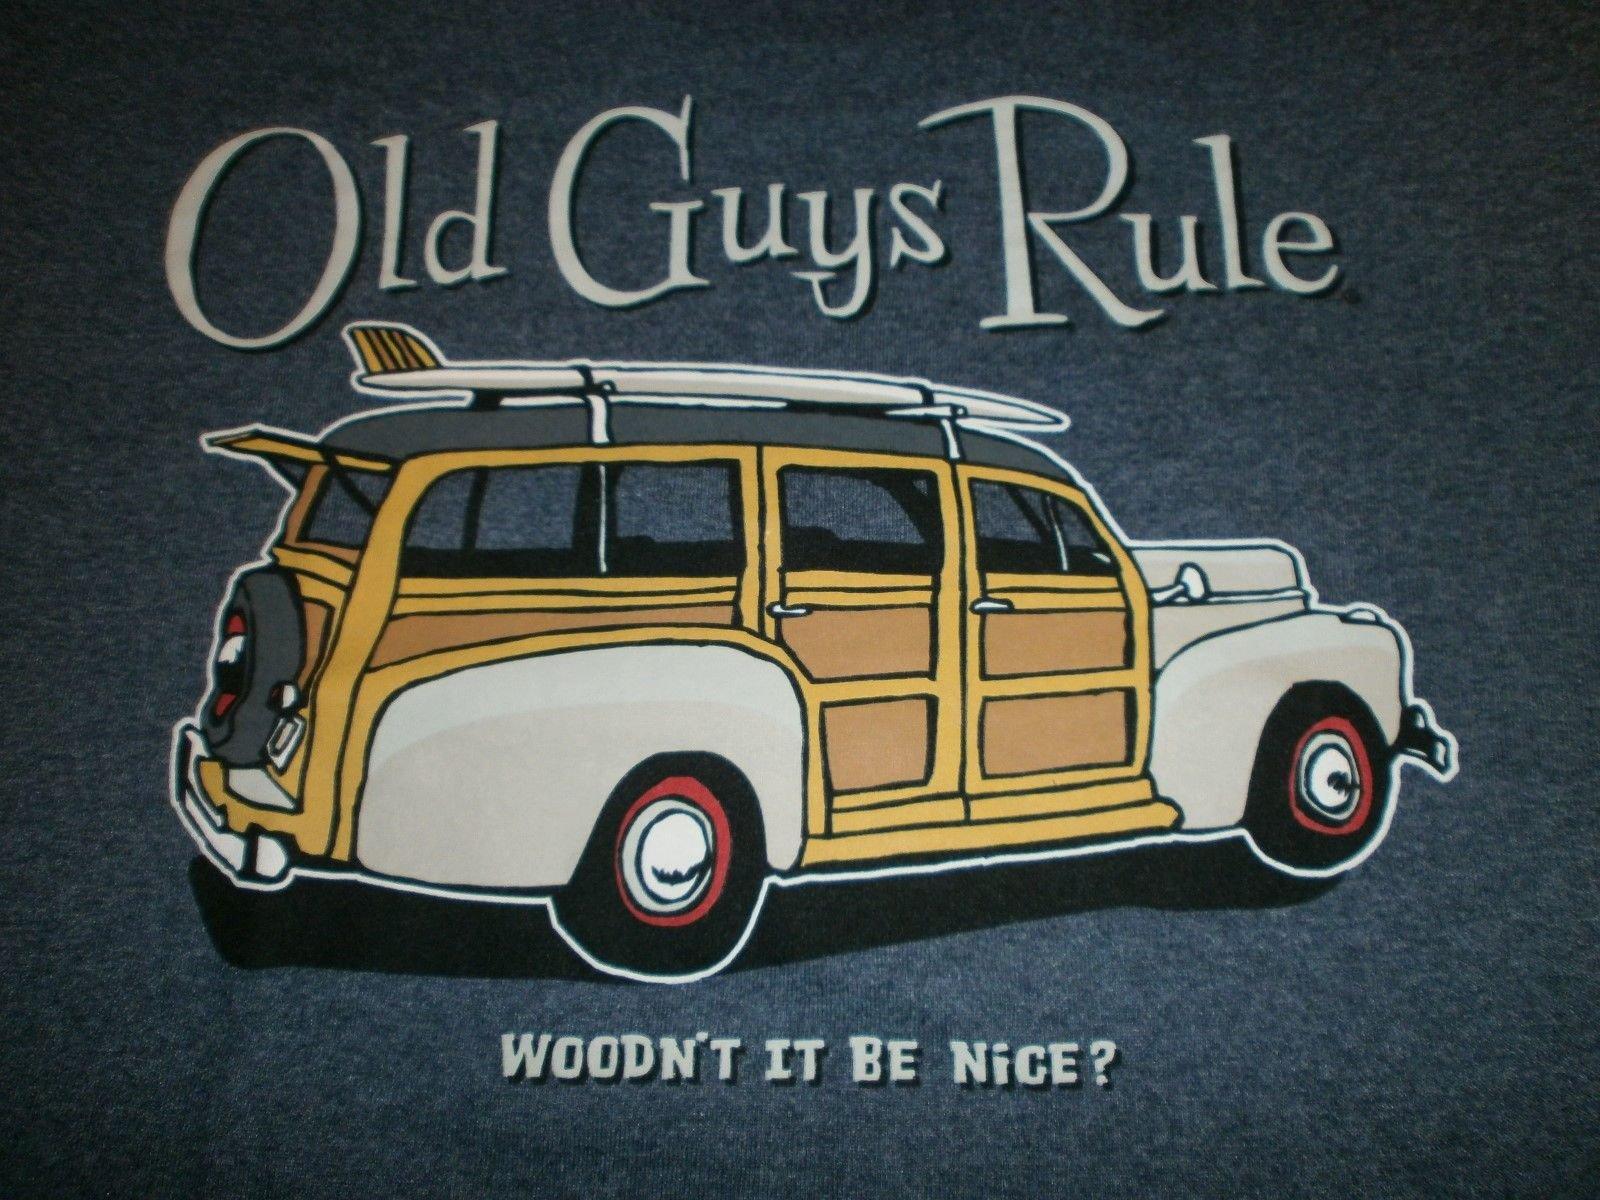 Old Guys Rule Woody Wouldn't IT BE Nice SURF Surfboard Longboard FIN Beach XL